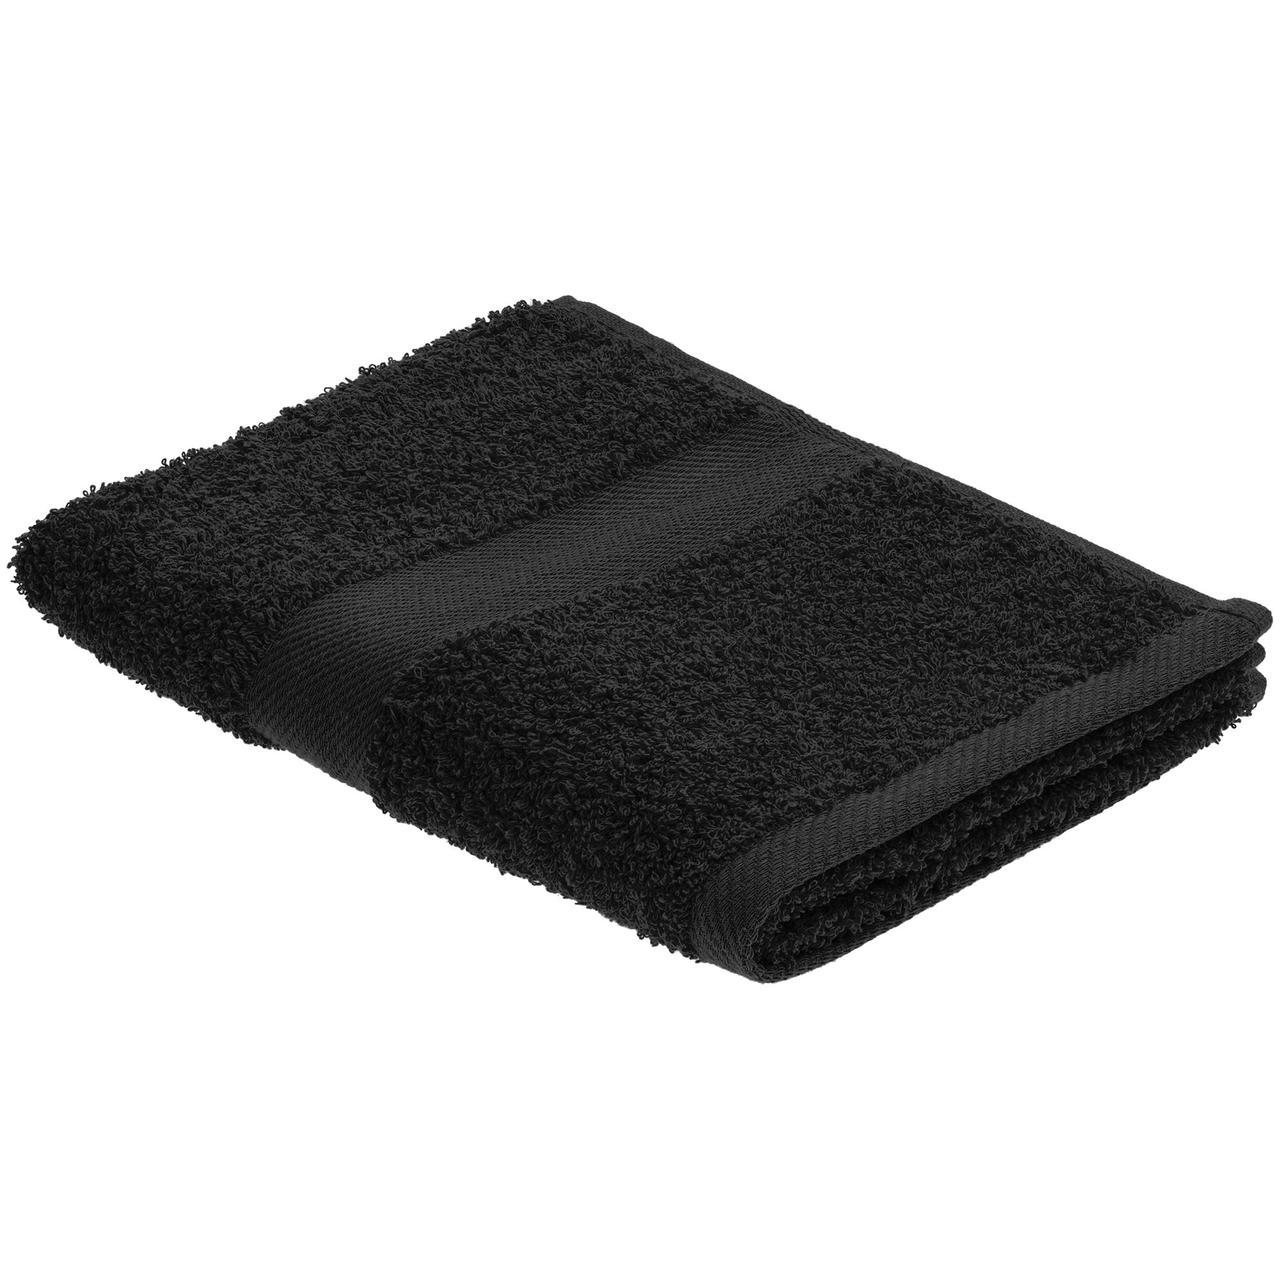 Полотенце Embrace, среднее, черное (артикул 20099.30)